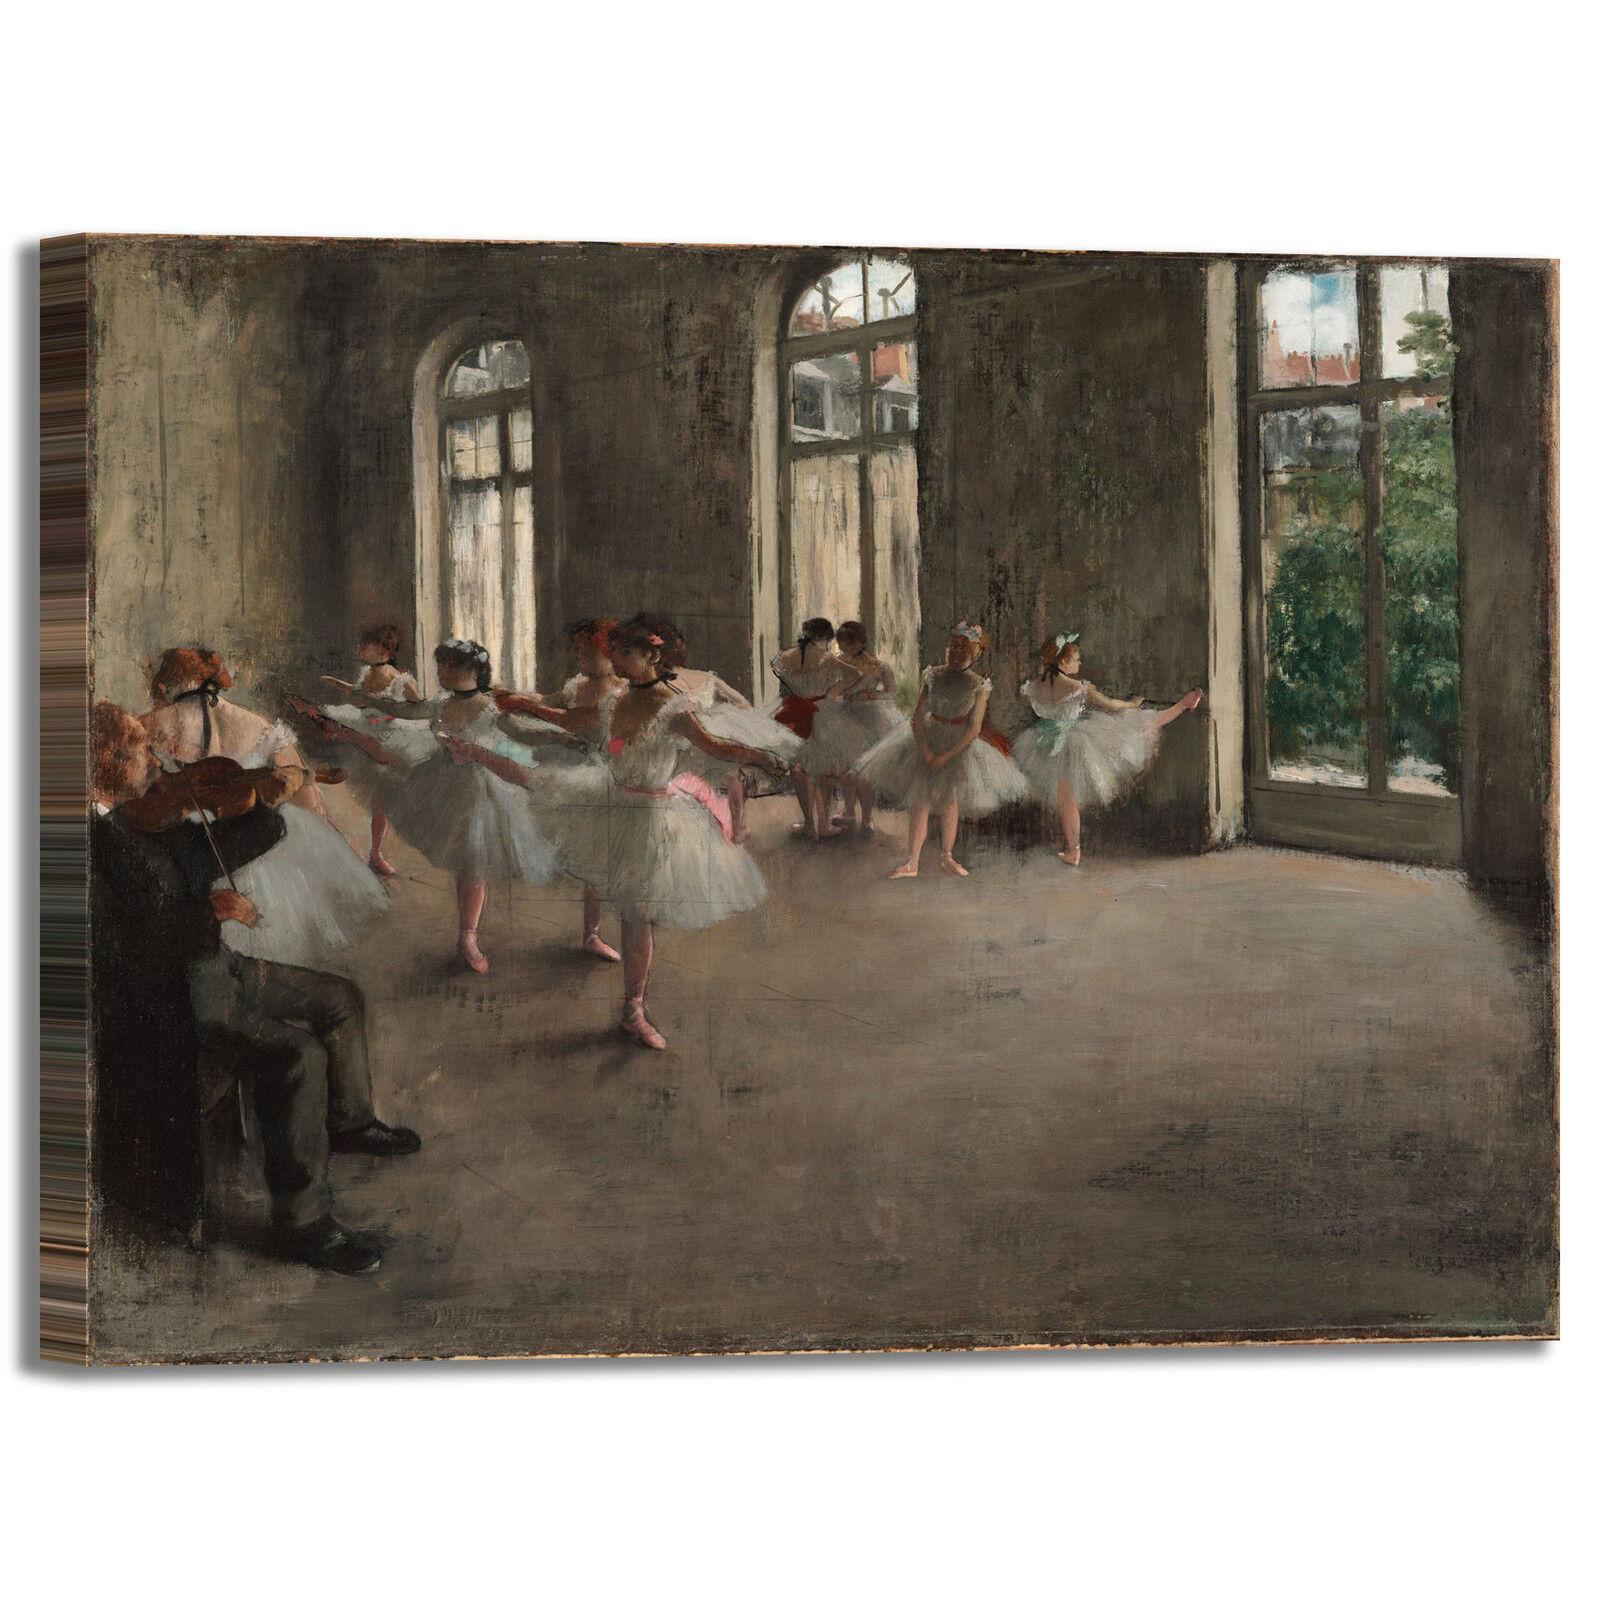 Degas prova generale design quadro stampa tela dipinto telaio arrossoo casa